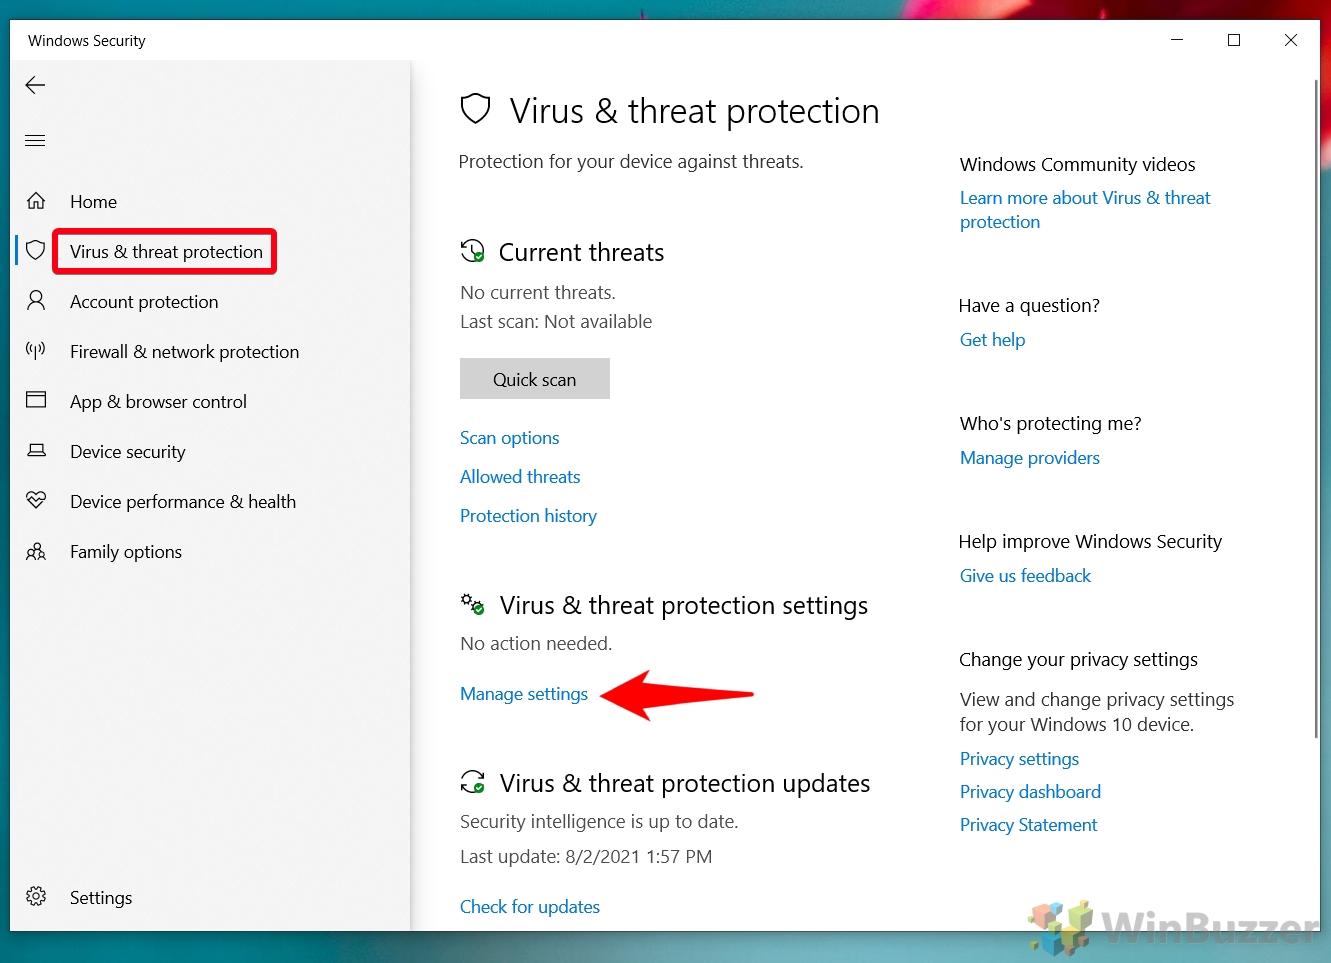 Windows 10 - Windows Security - Virus & Threat Protection - Manage Settings